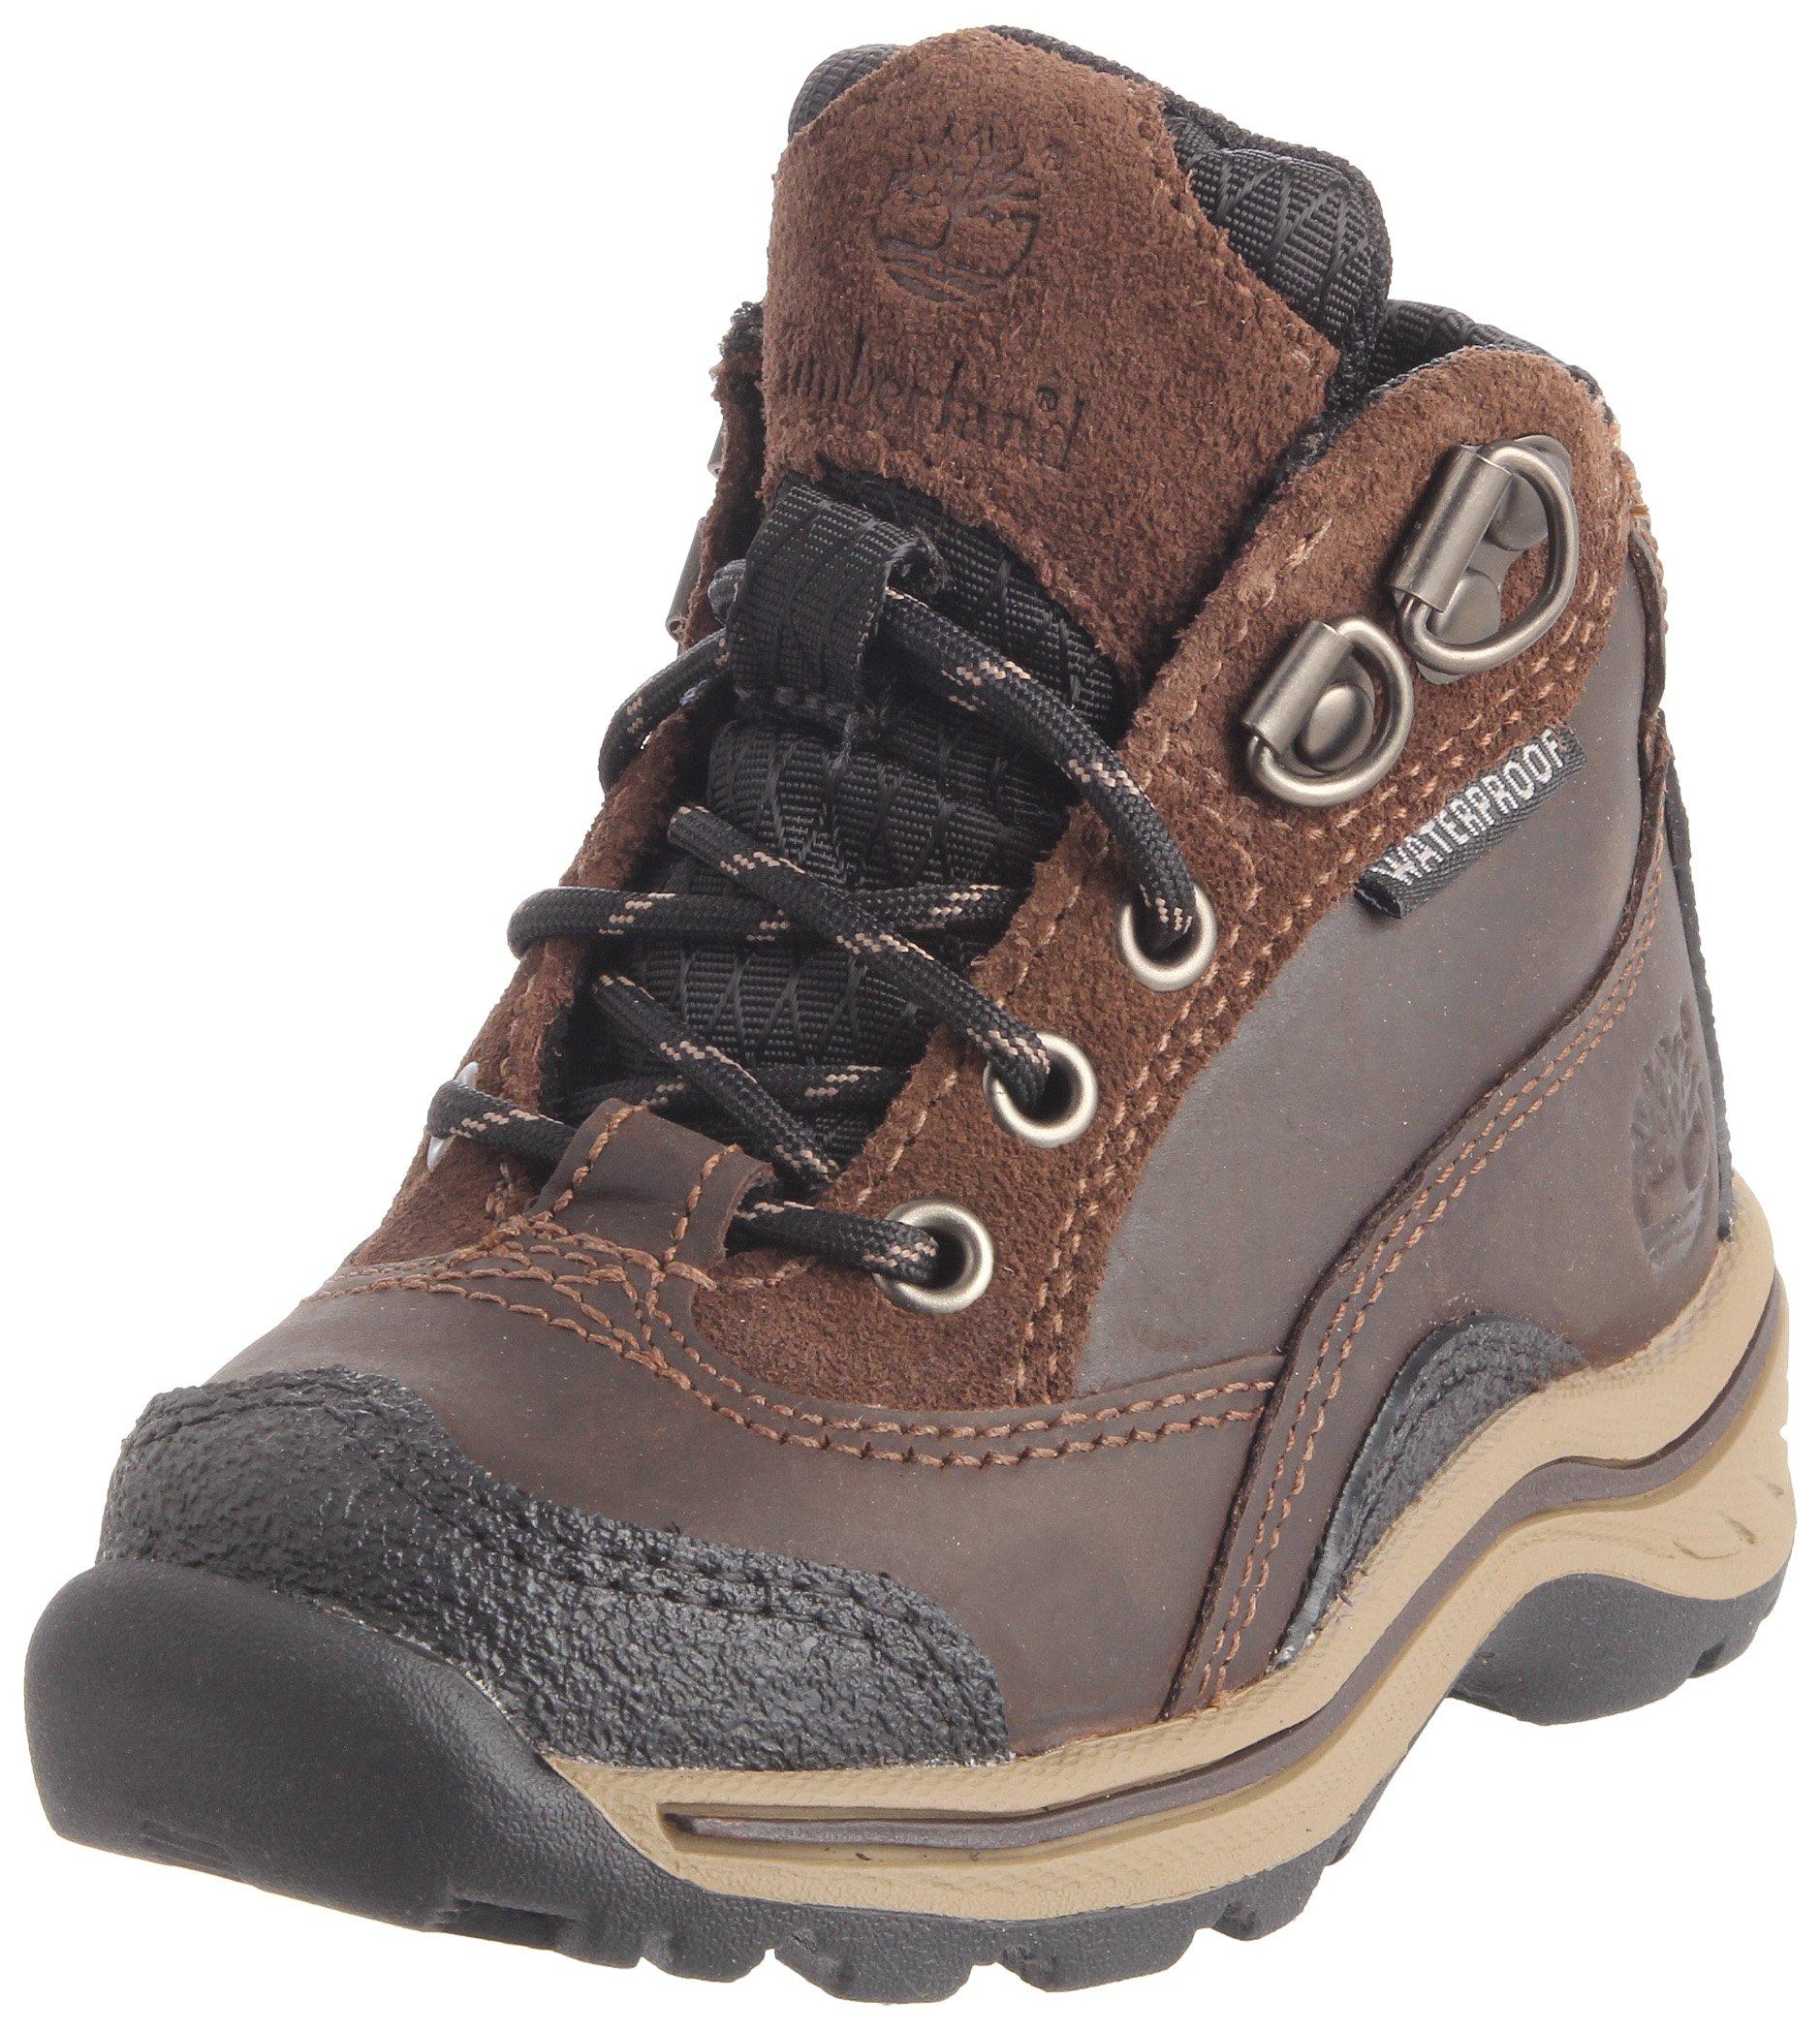 Timberland Pawtuckaway, Unisex-Child Hiking Shoes 1